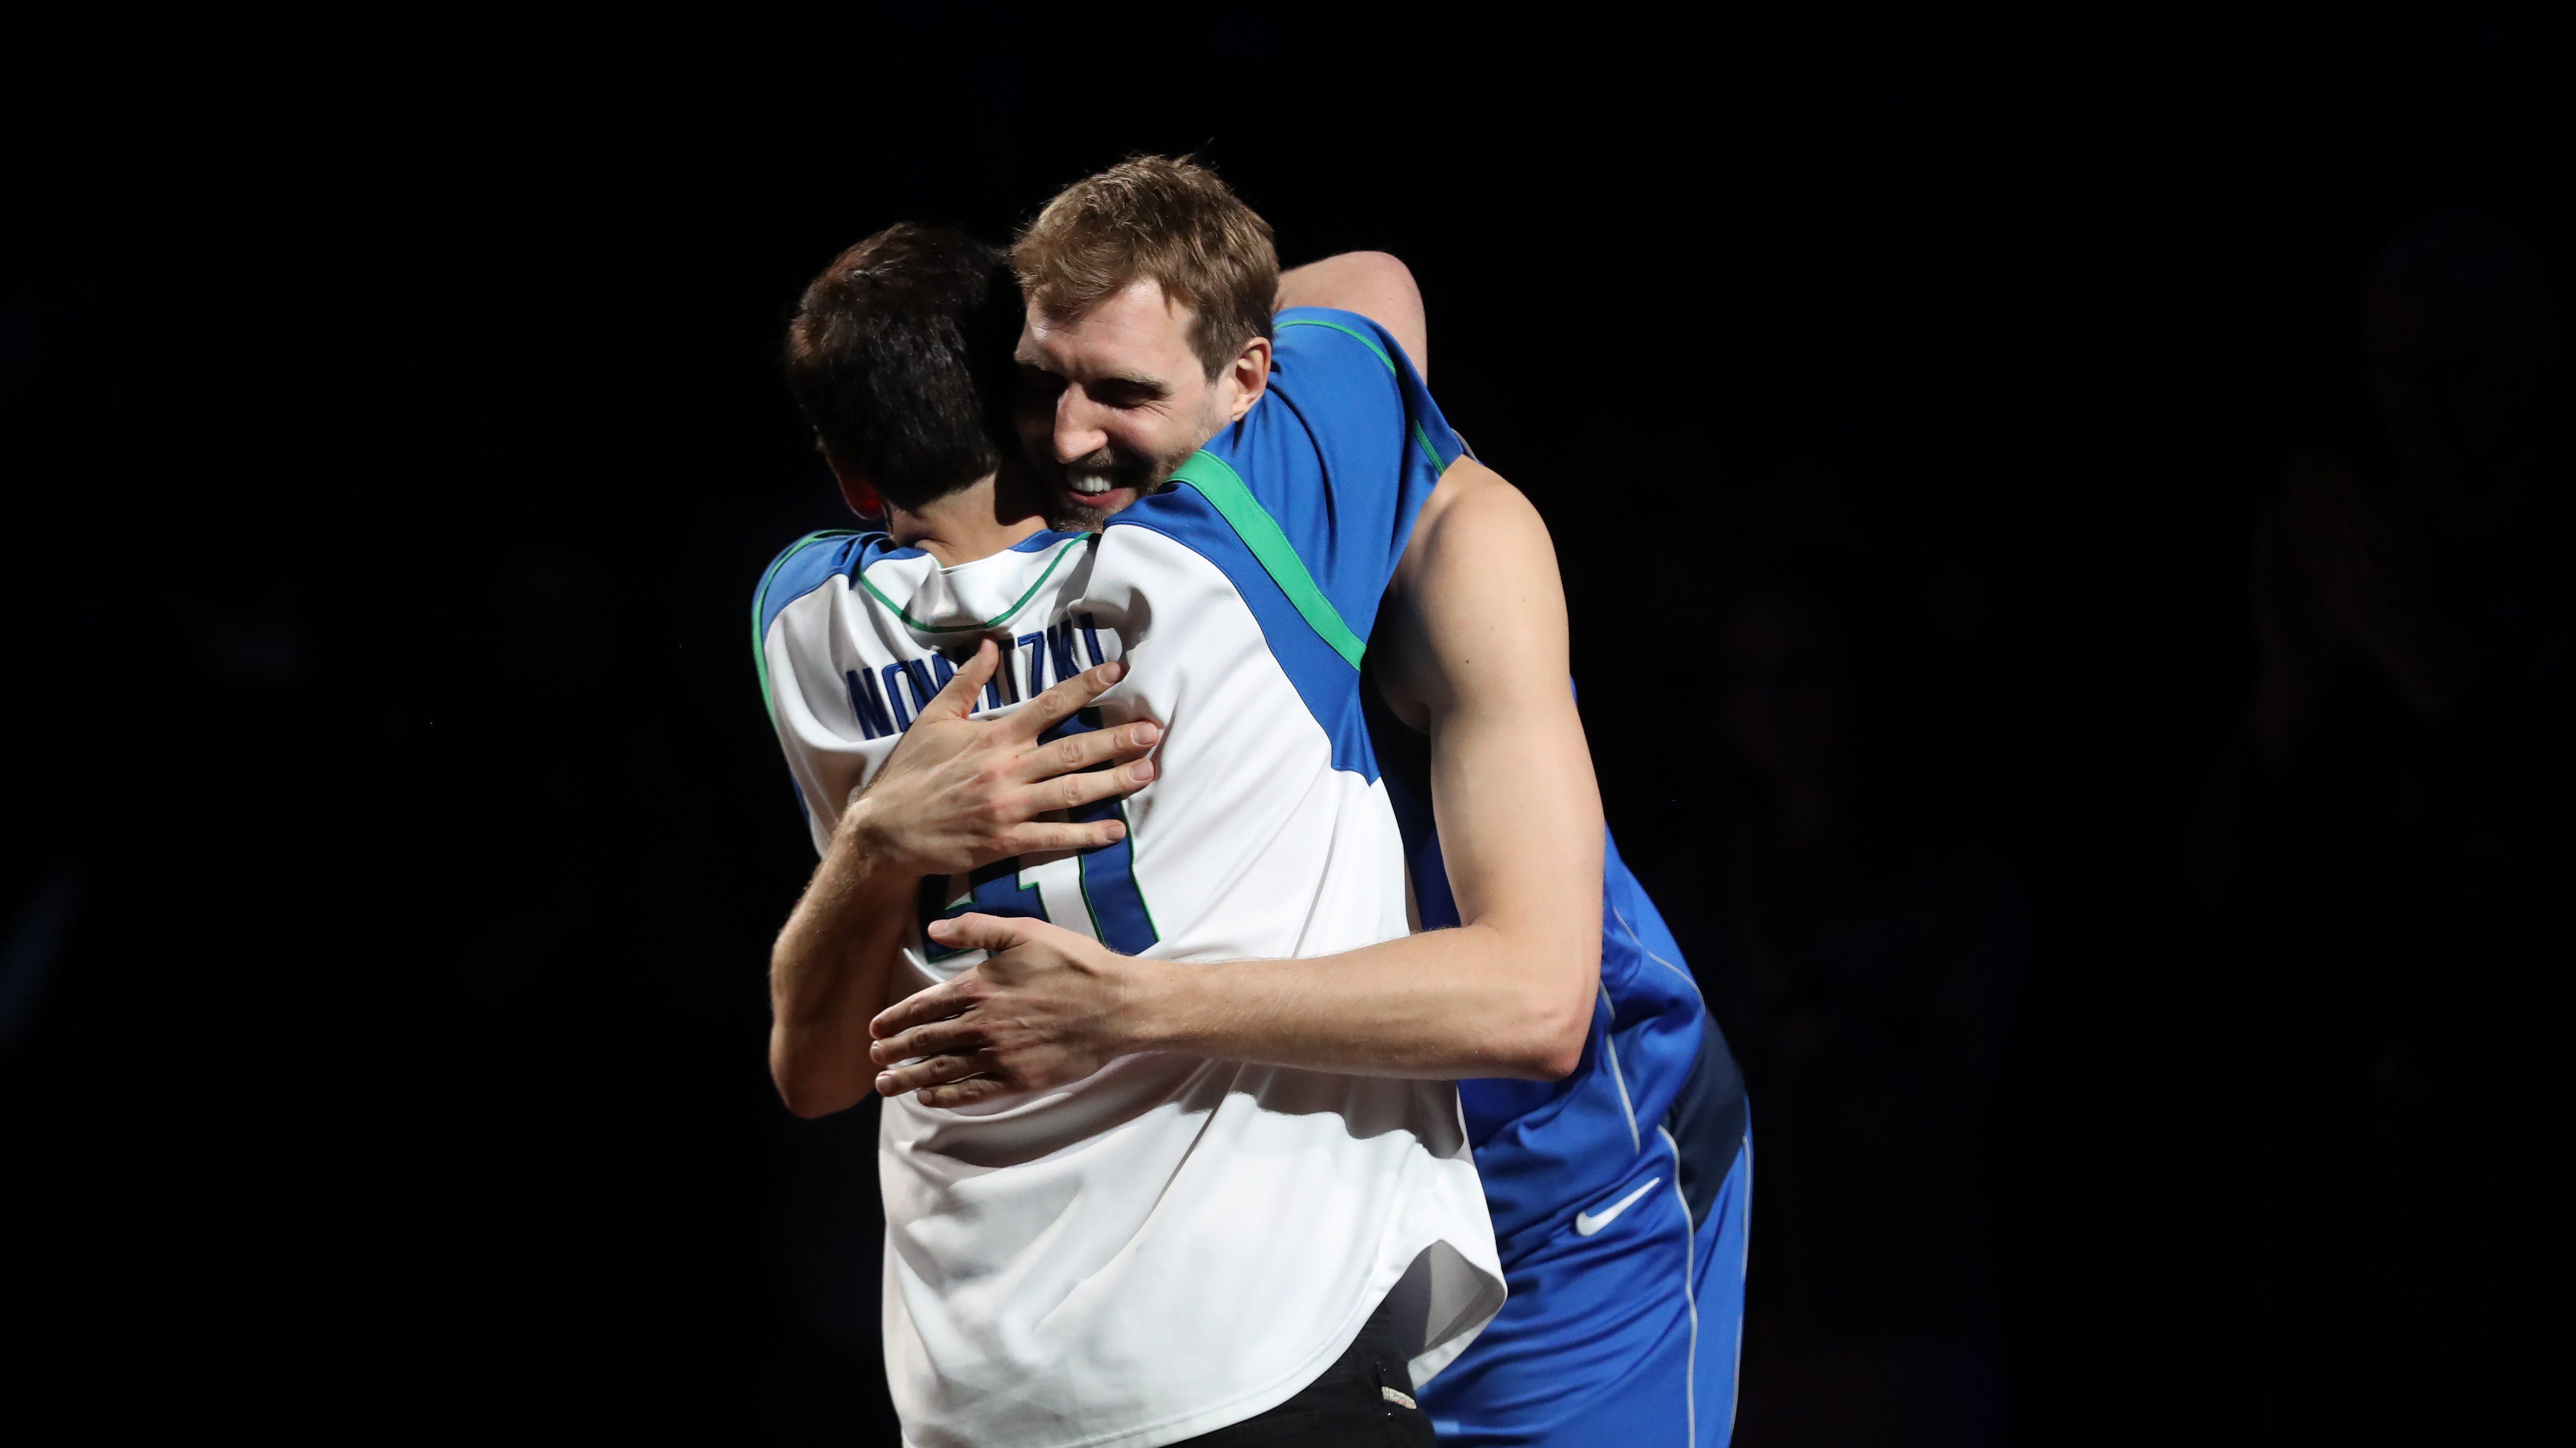 Dirk Nowitzki and Mark Cuban